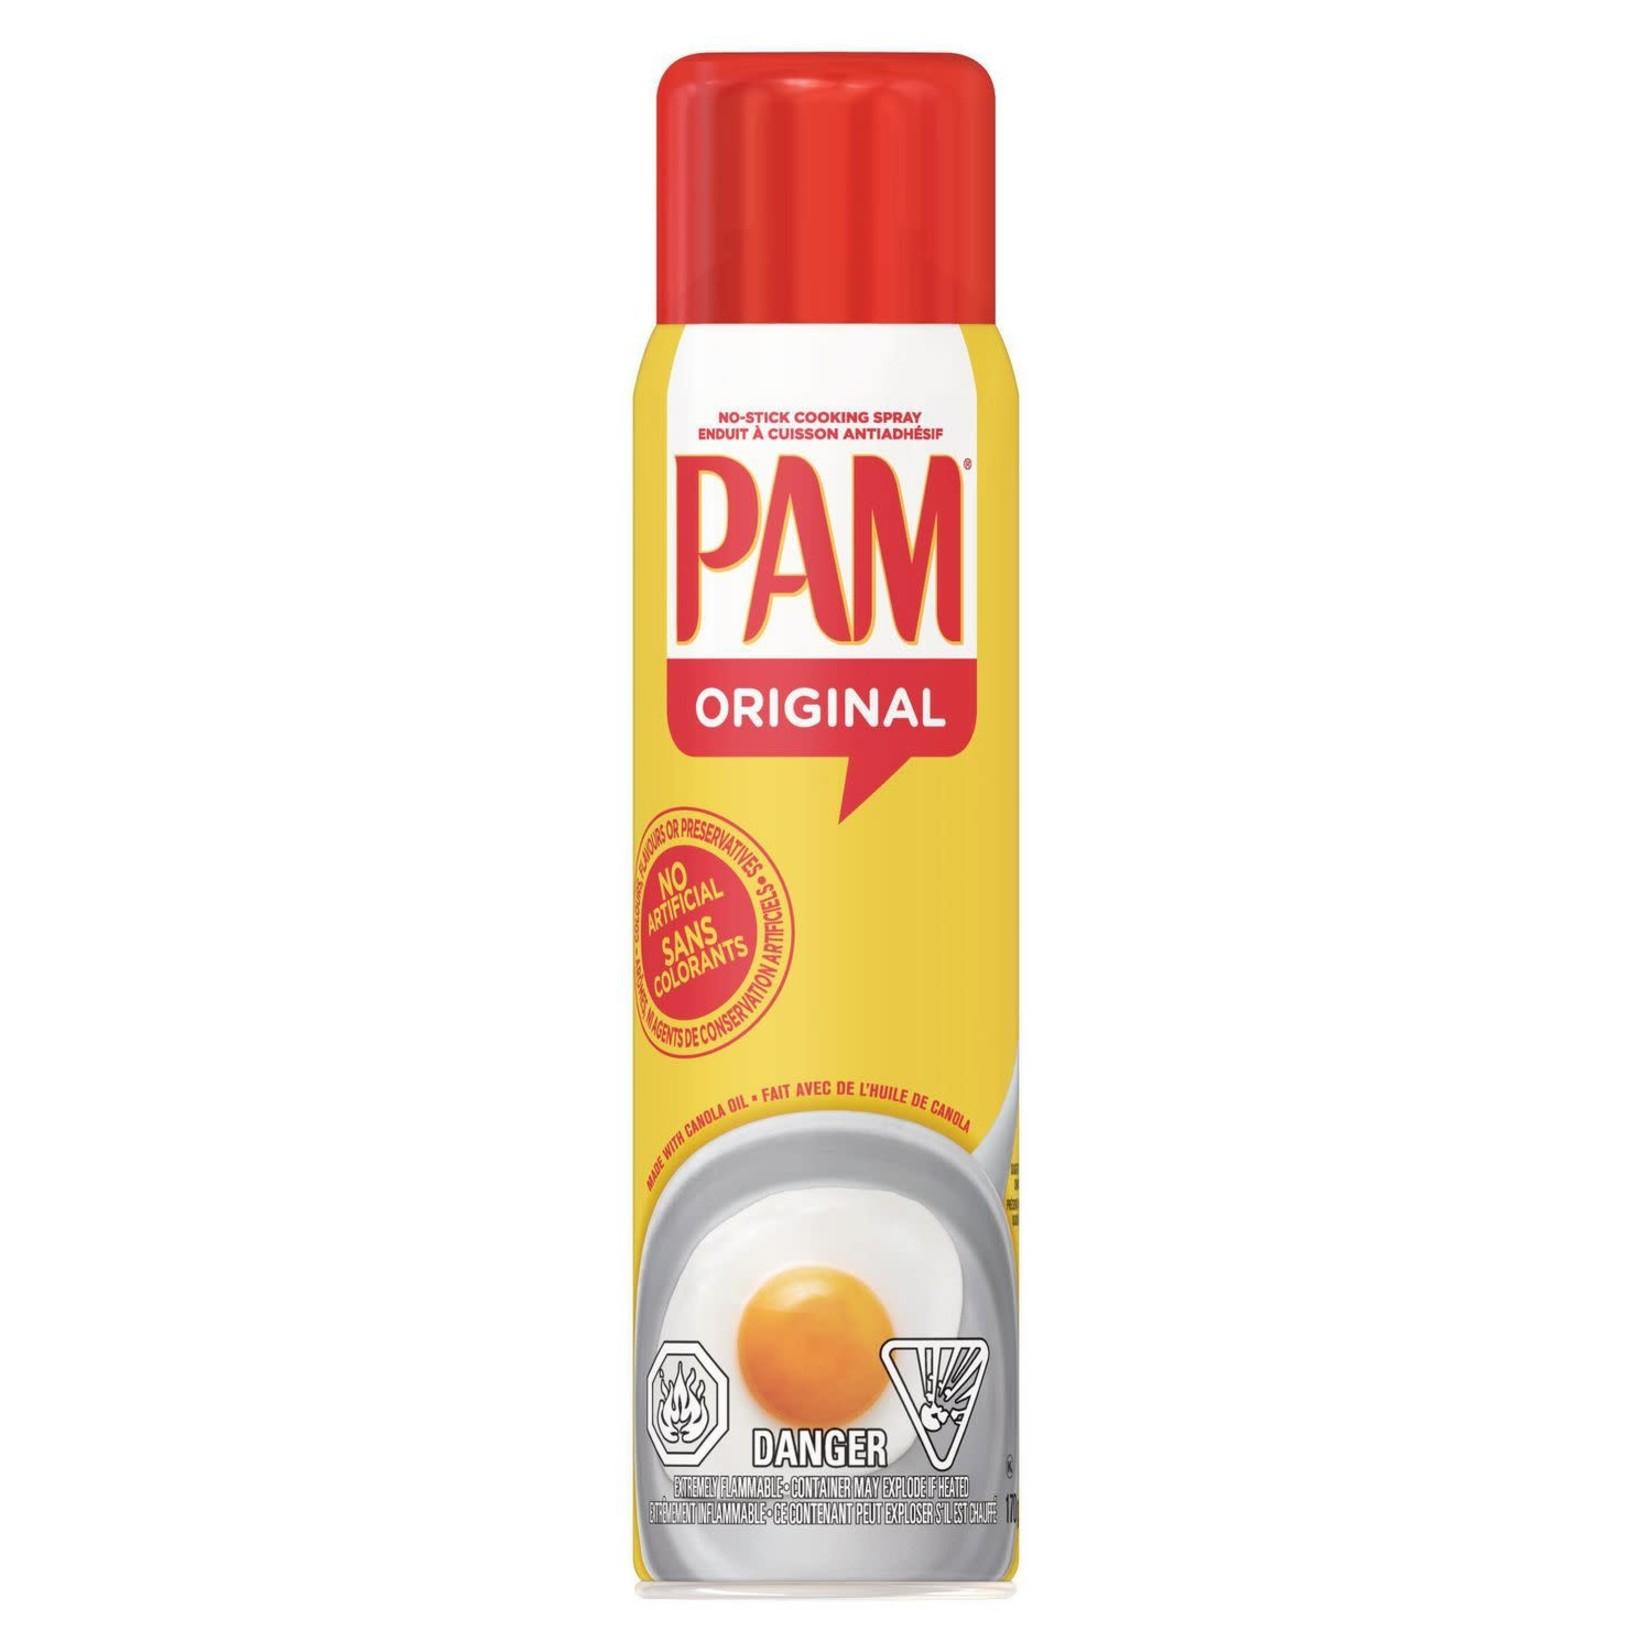 Pam Original Cooking Spray 170 g